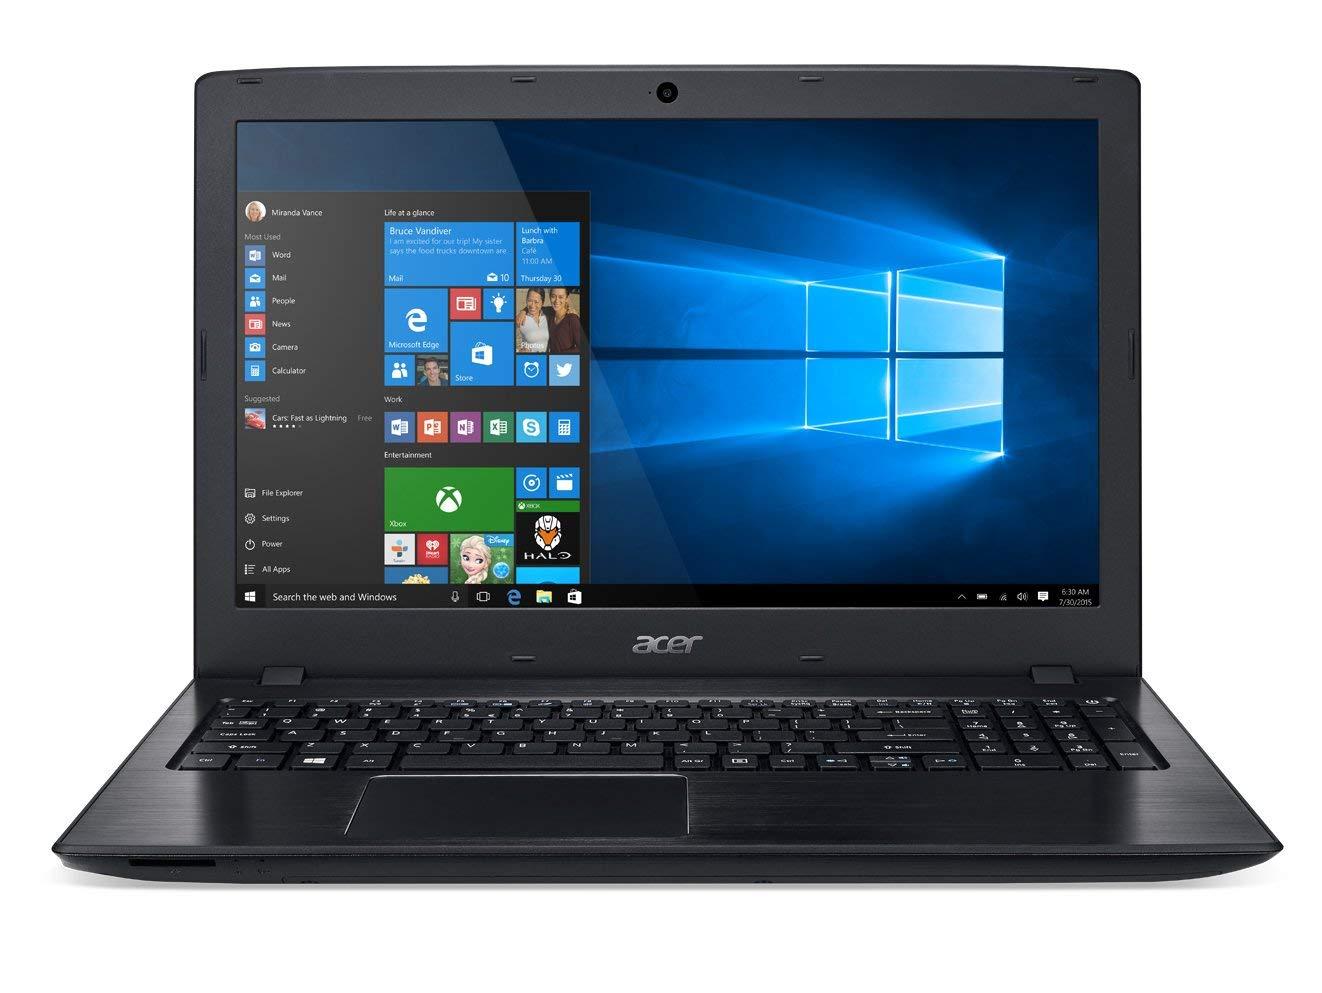 Prime Members: Acer Aspire E15 15.6'' FHD, i3-8130U, 6GB RAM, 1TB HDD, DVD-RW $329.99 + FS